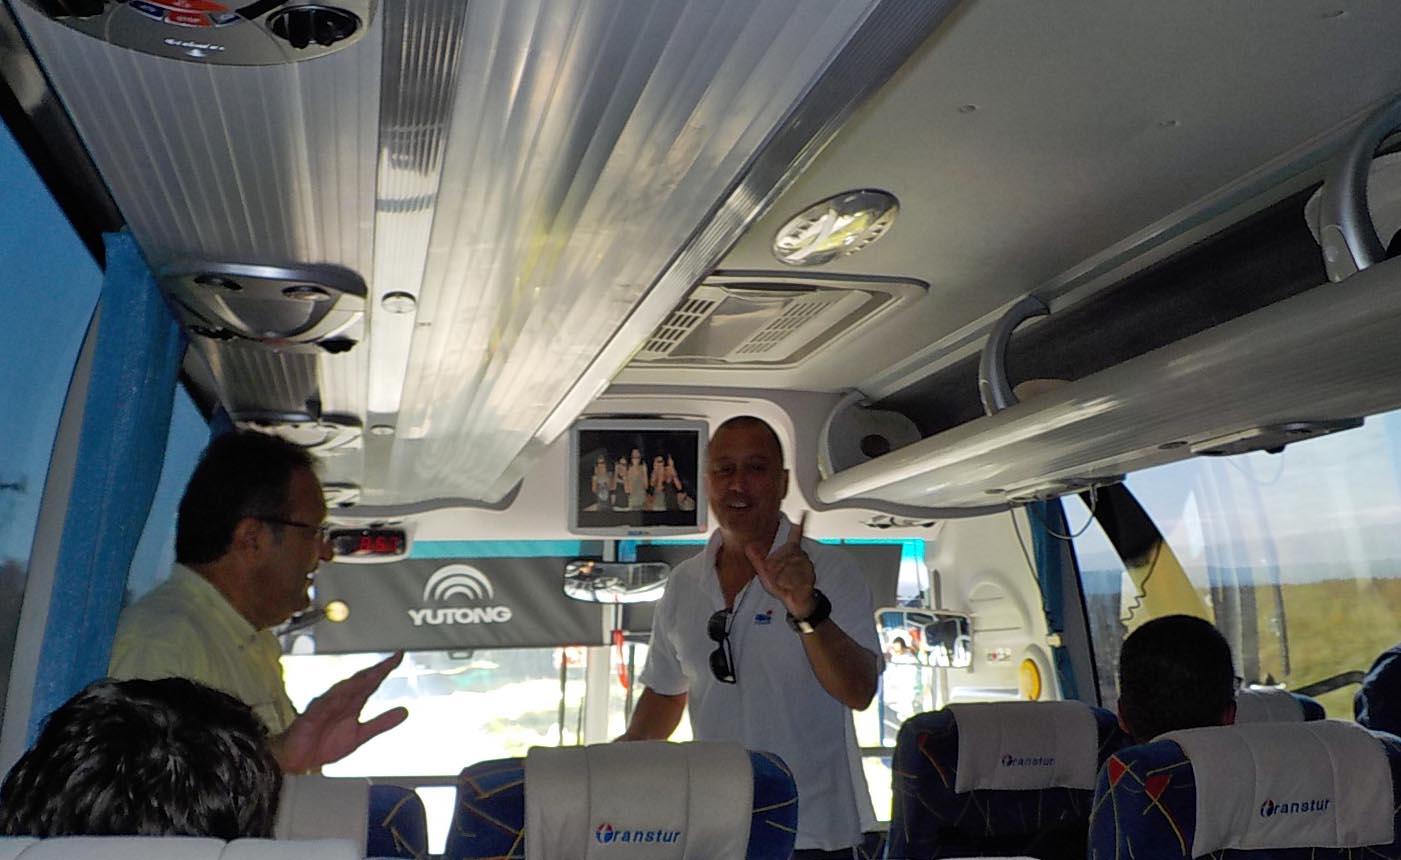 10-21-16-marlon-on-the-bus-karaoke-001